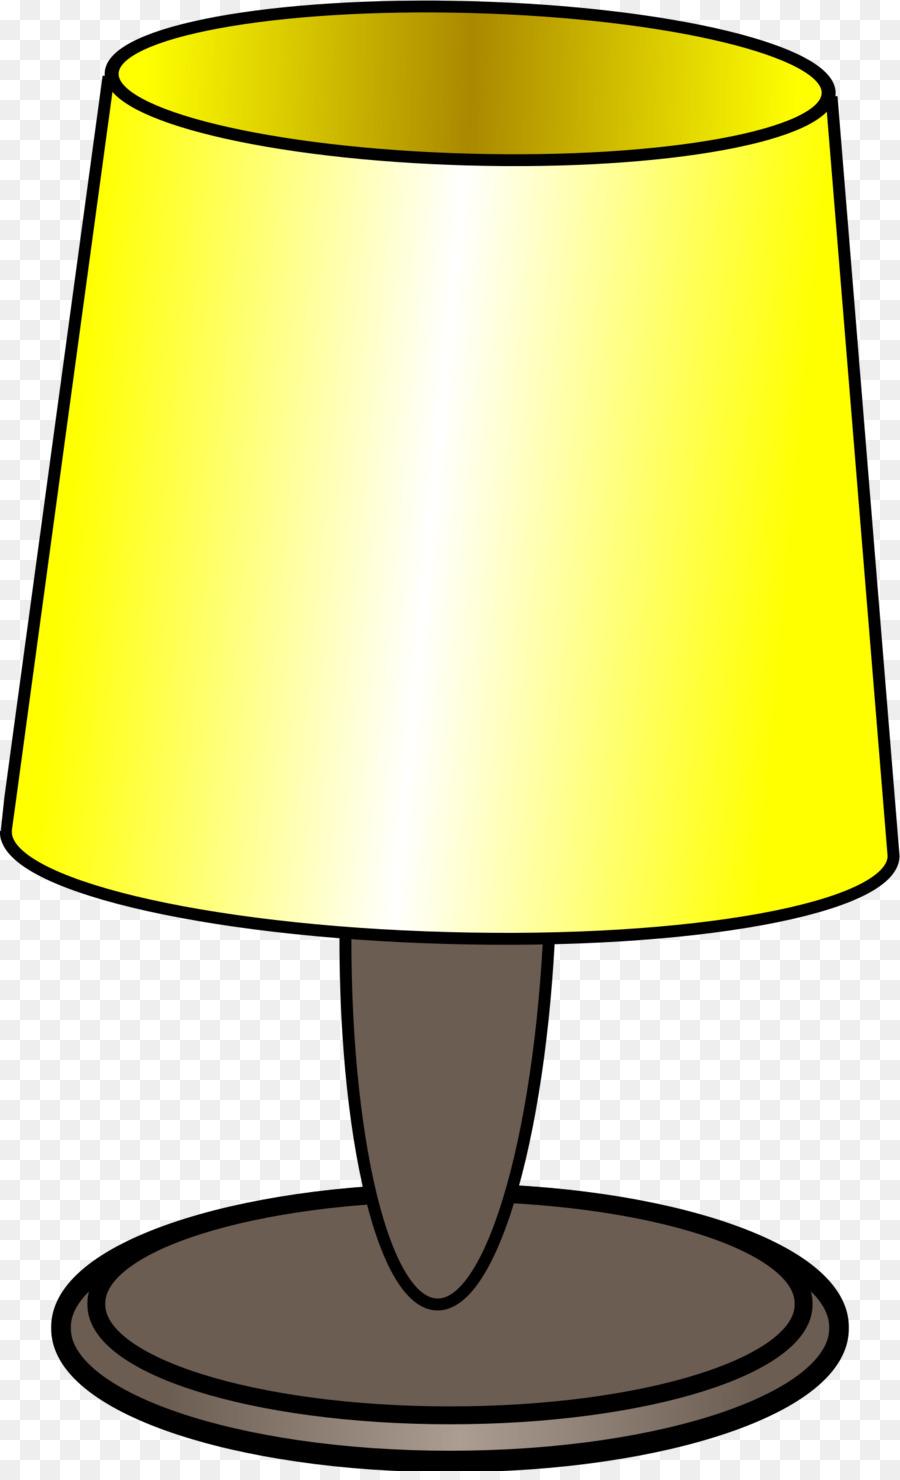 Lamp clipart cartoon. Light bulb yellow